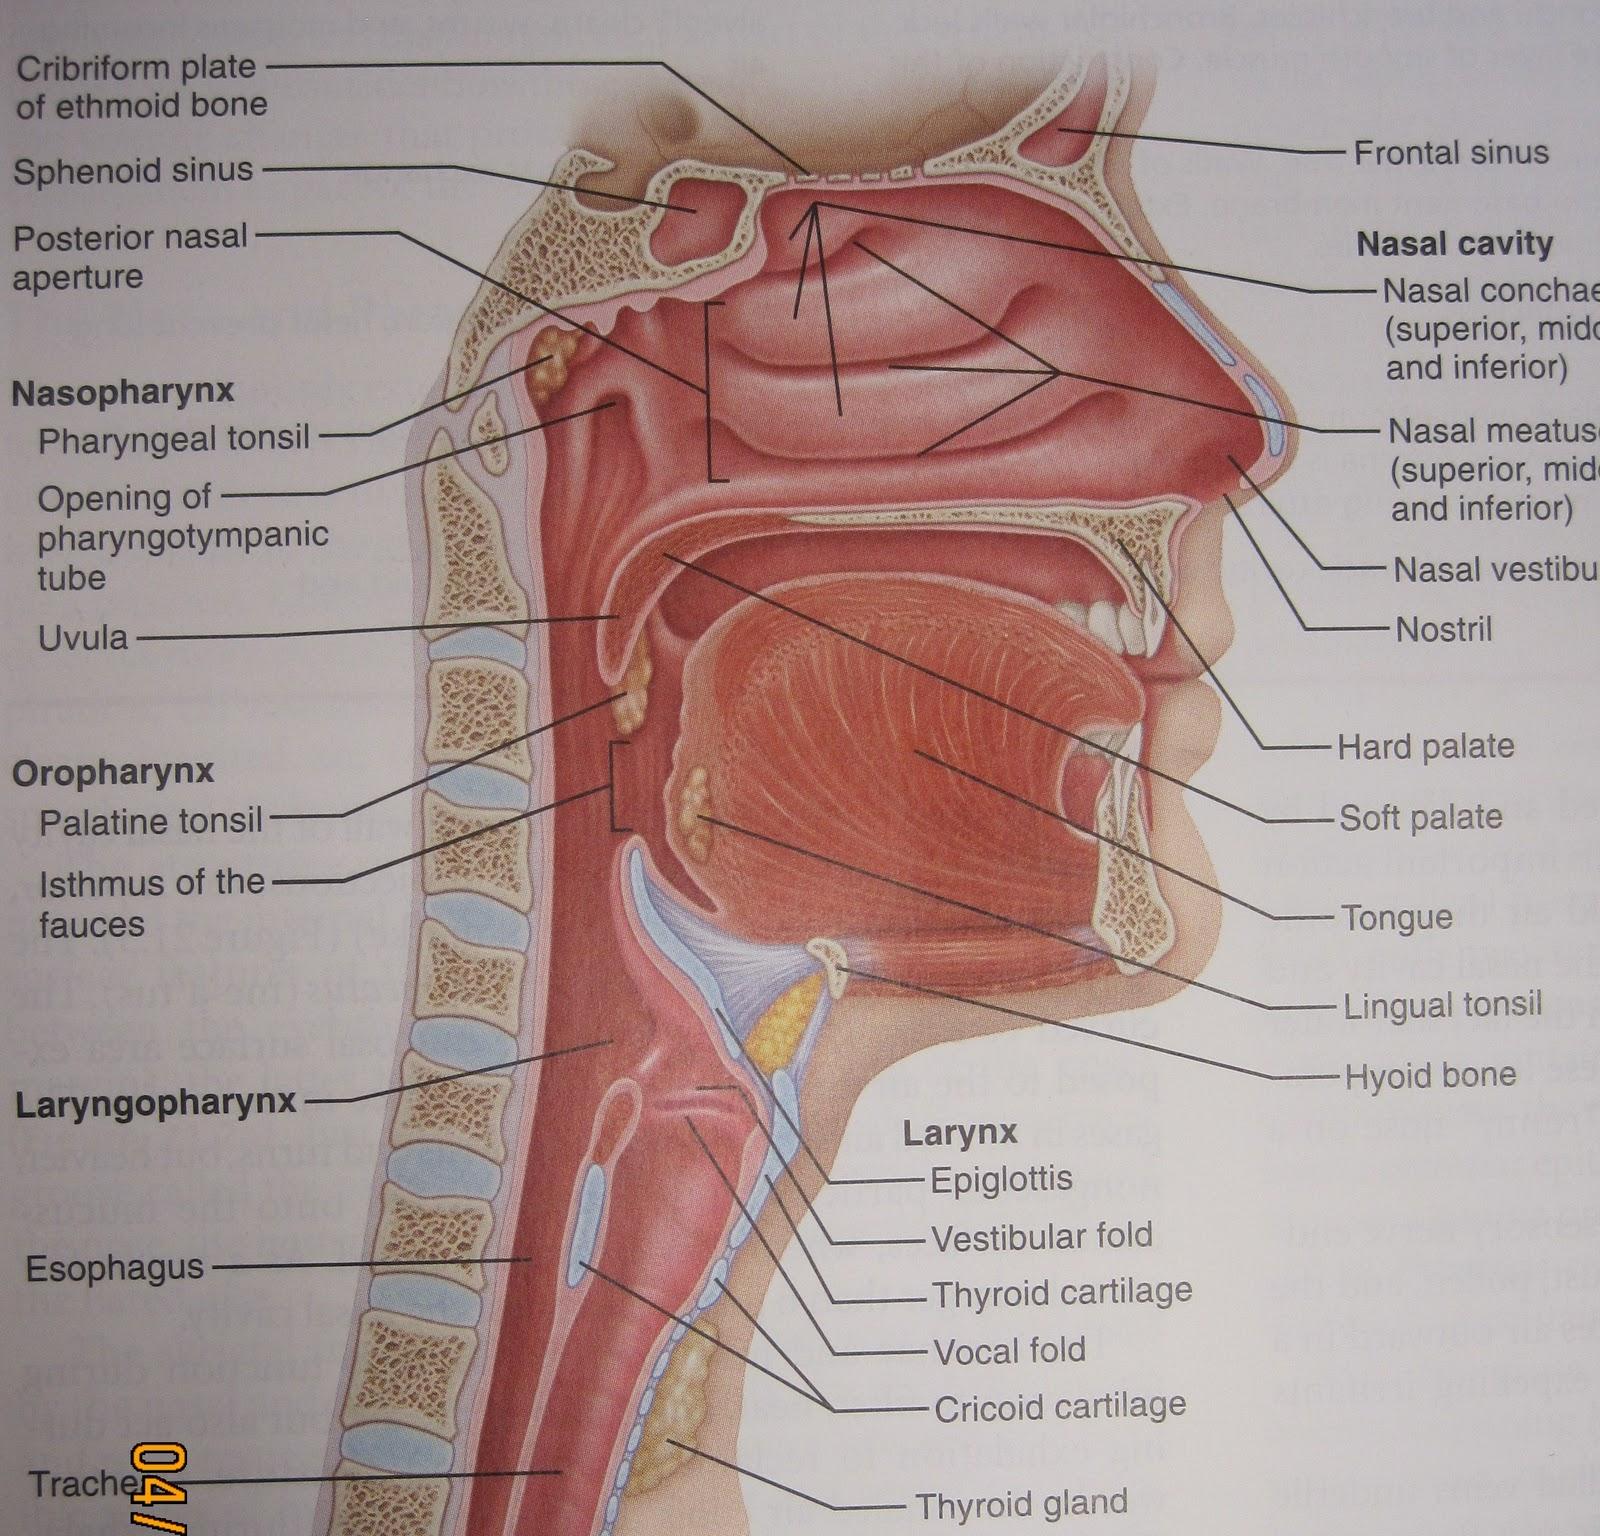 Anatomy and Physiology 2 Eportfolio: Objective 43 & 44: Respiratory ...